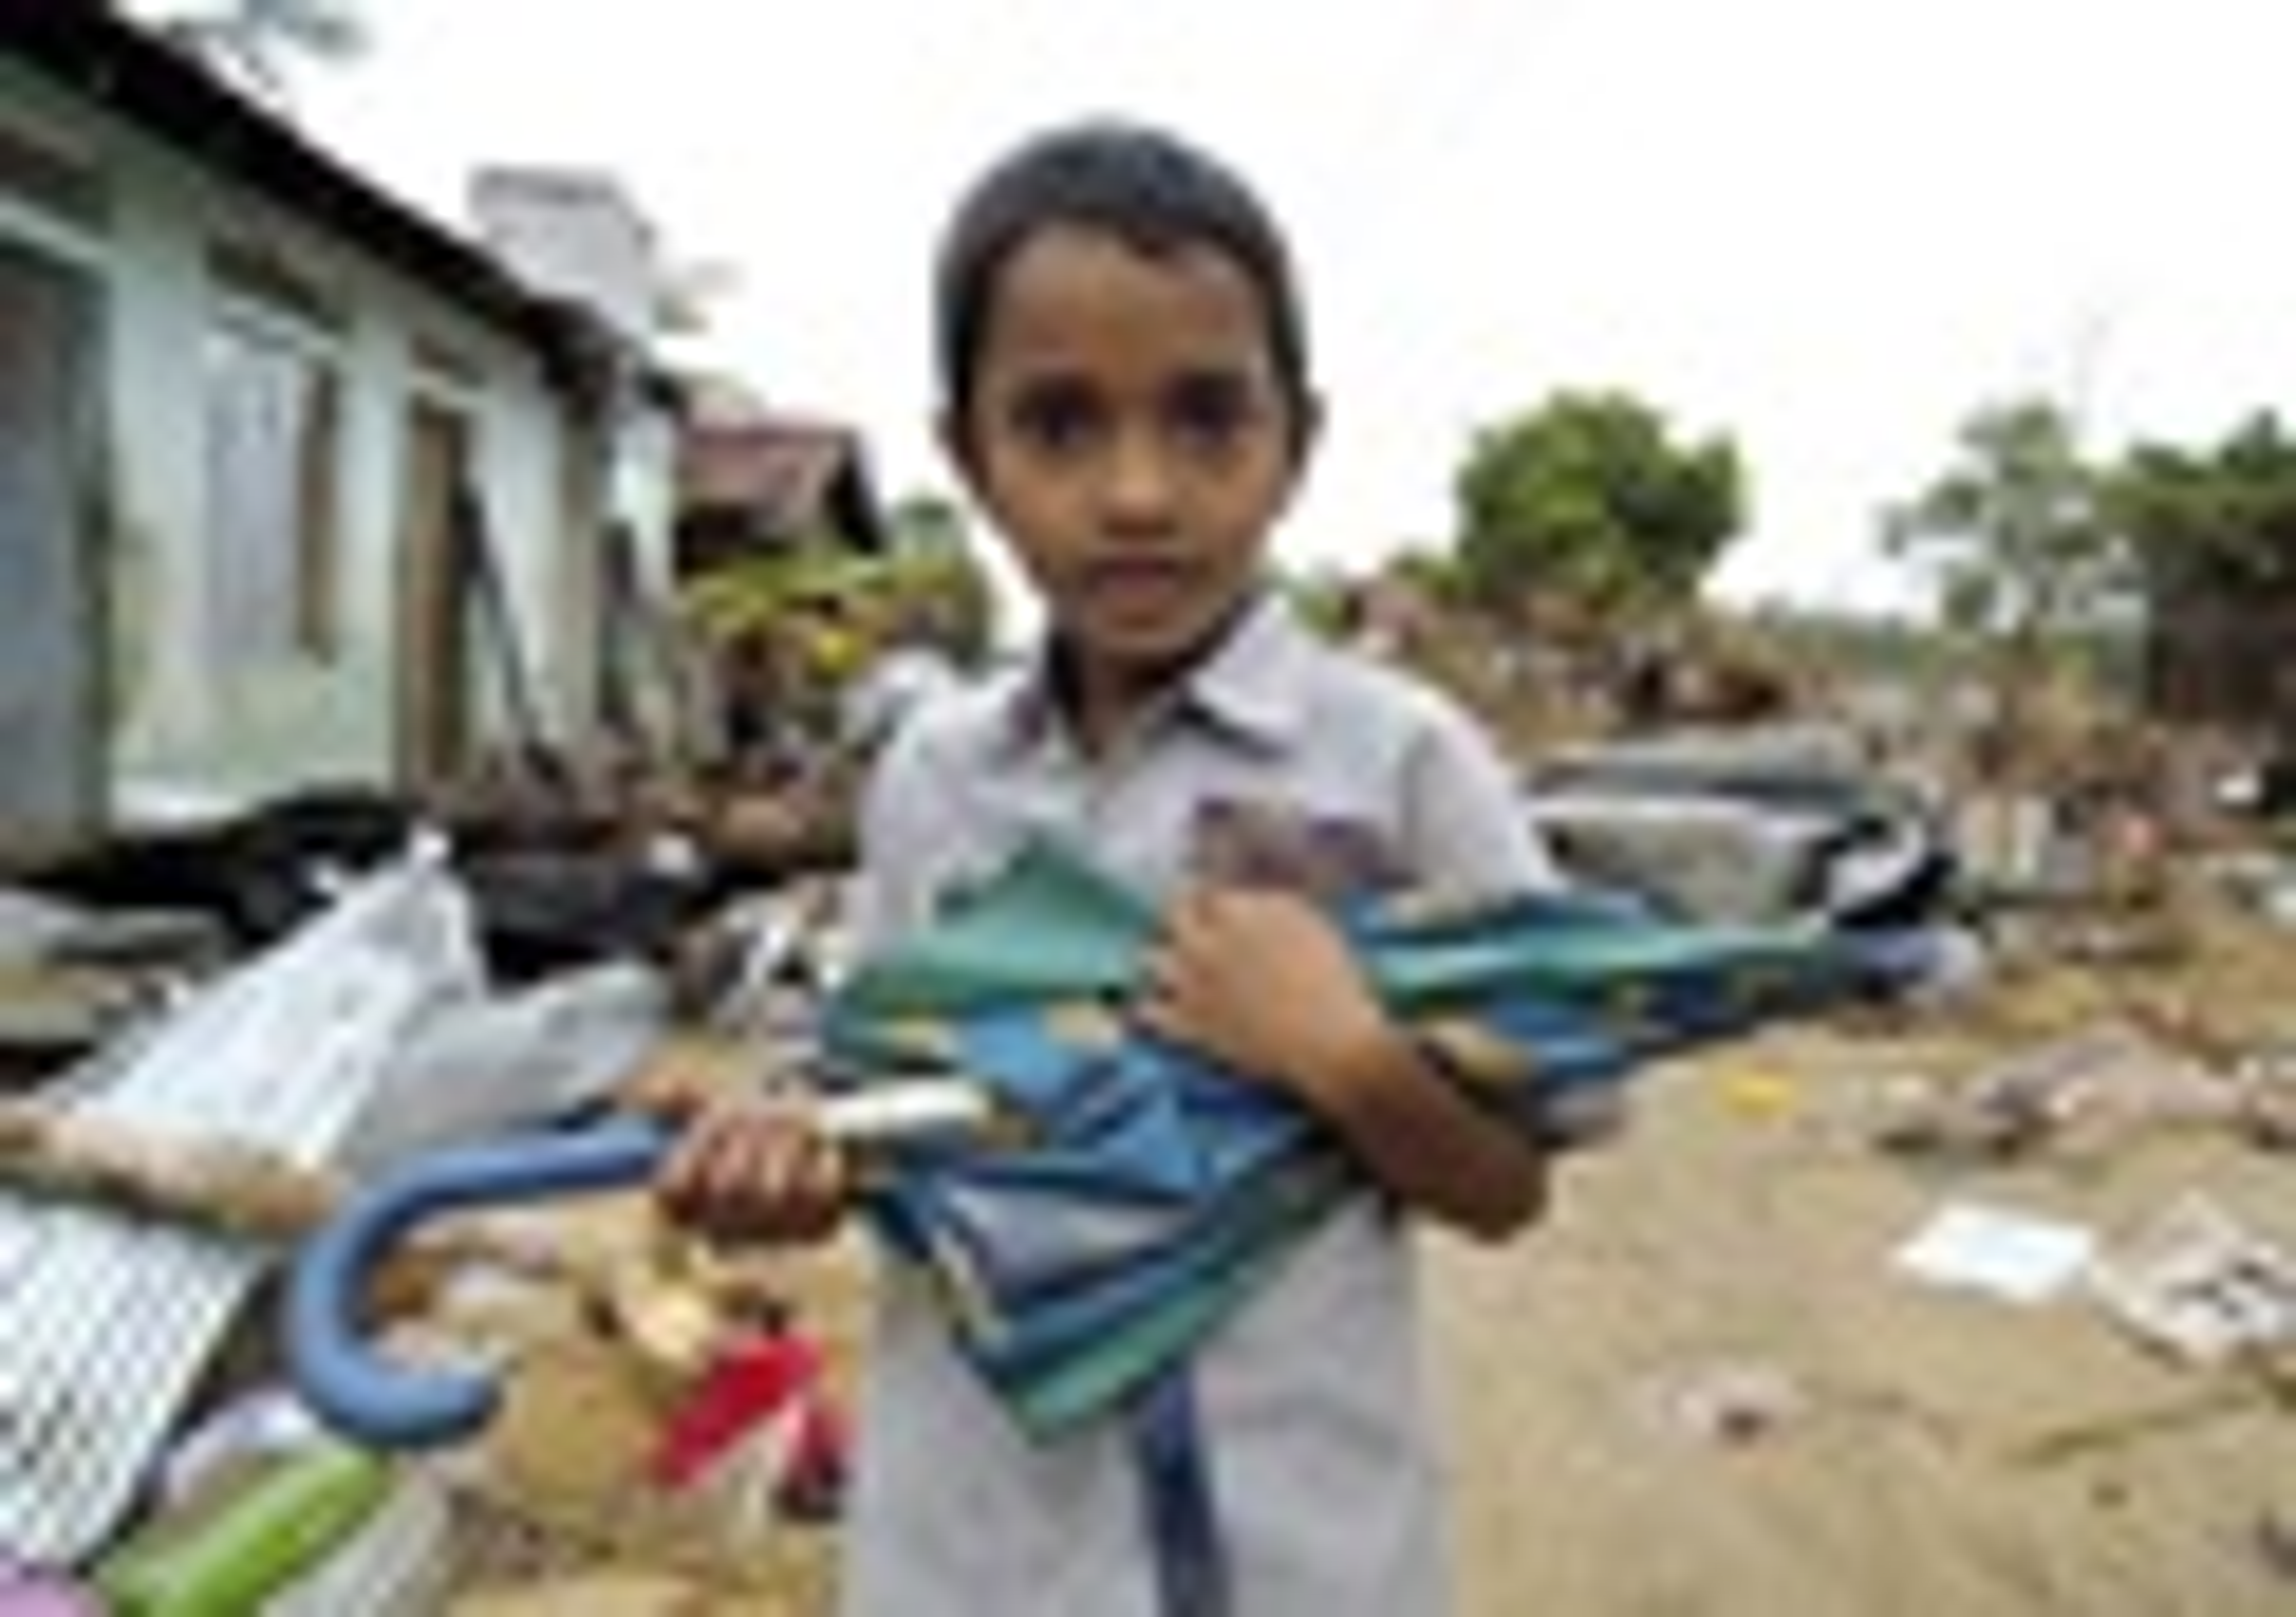 A young tsunami survivor poses in Batticaloa, Sri Lanka. A UMNS photo by Paul Jeffrey, ACT International.